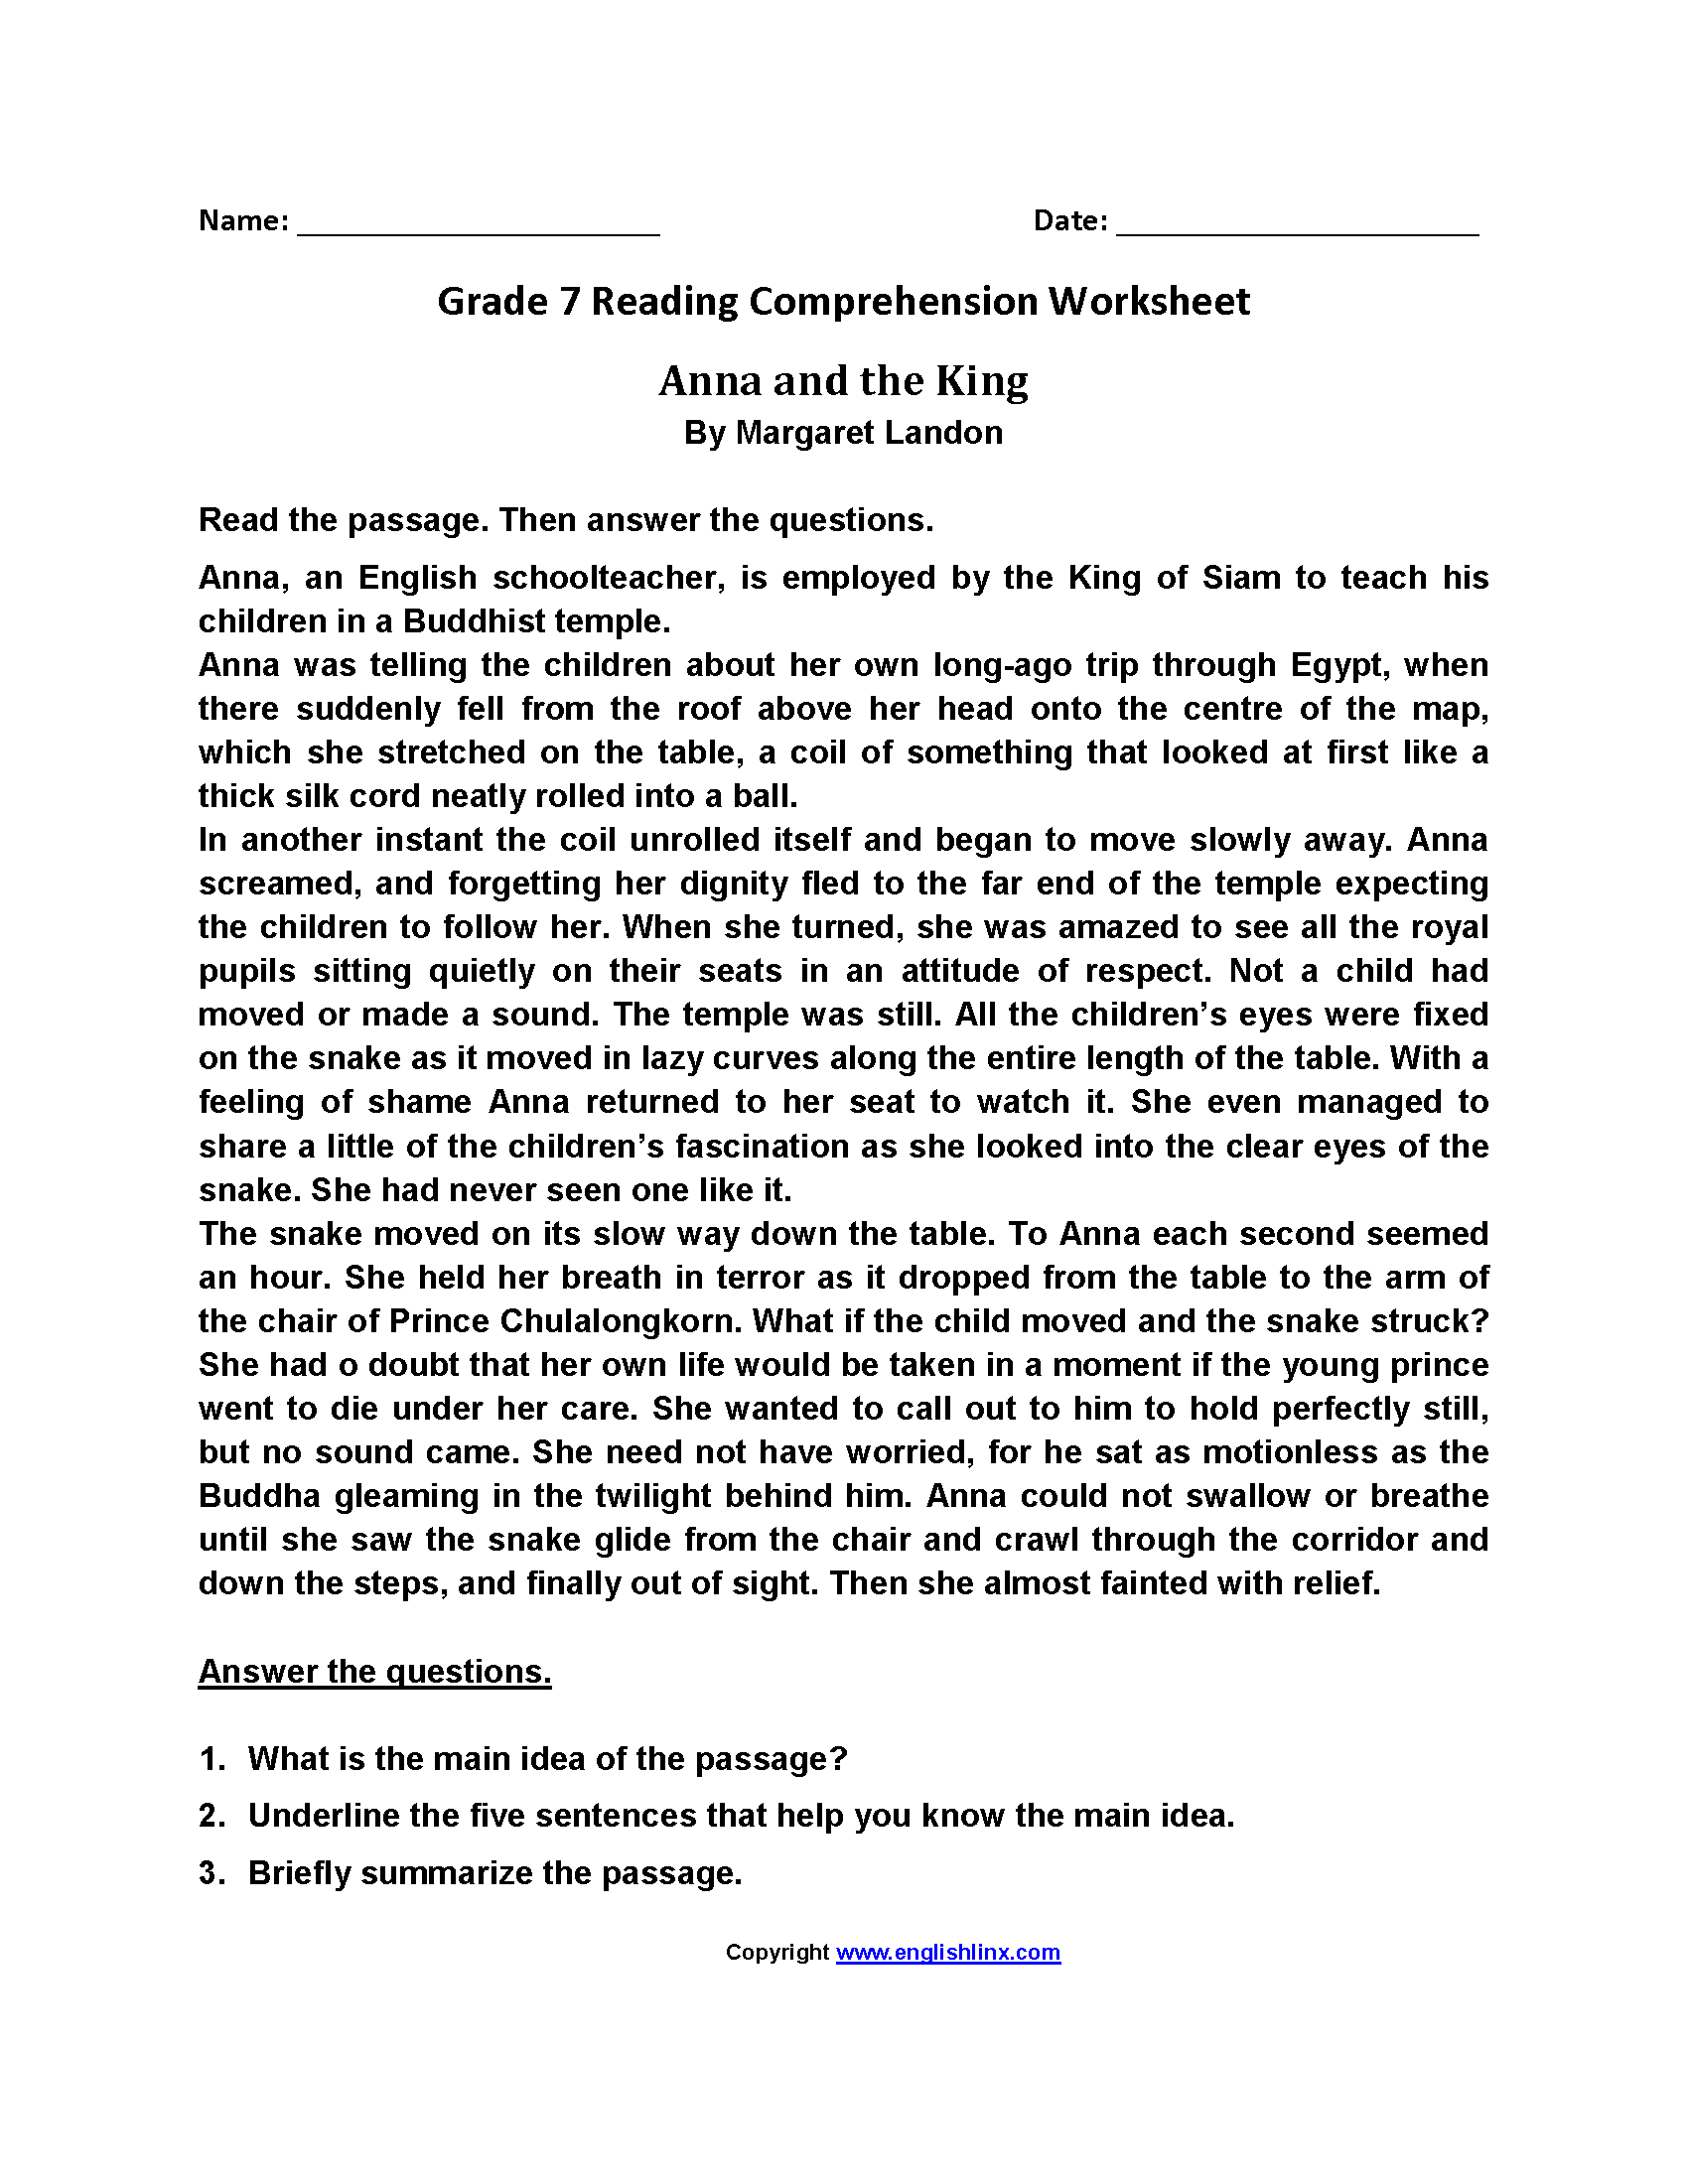 Reading Worksheets  Seventh Grade Reading Worksheets In Reading Comprehension Worksheets 7Th Grade